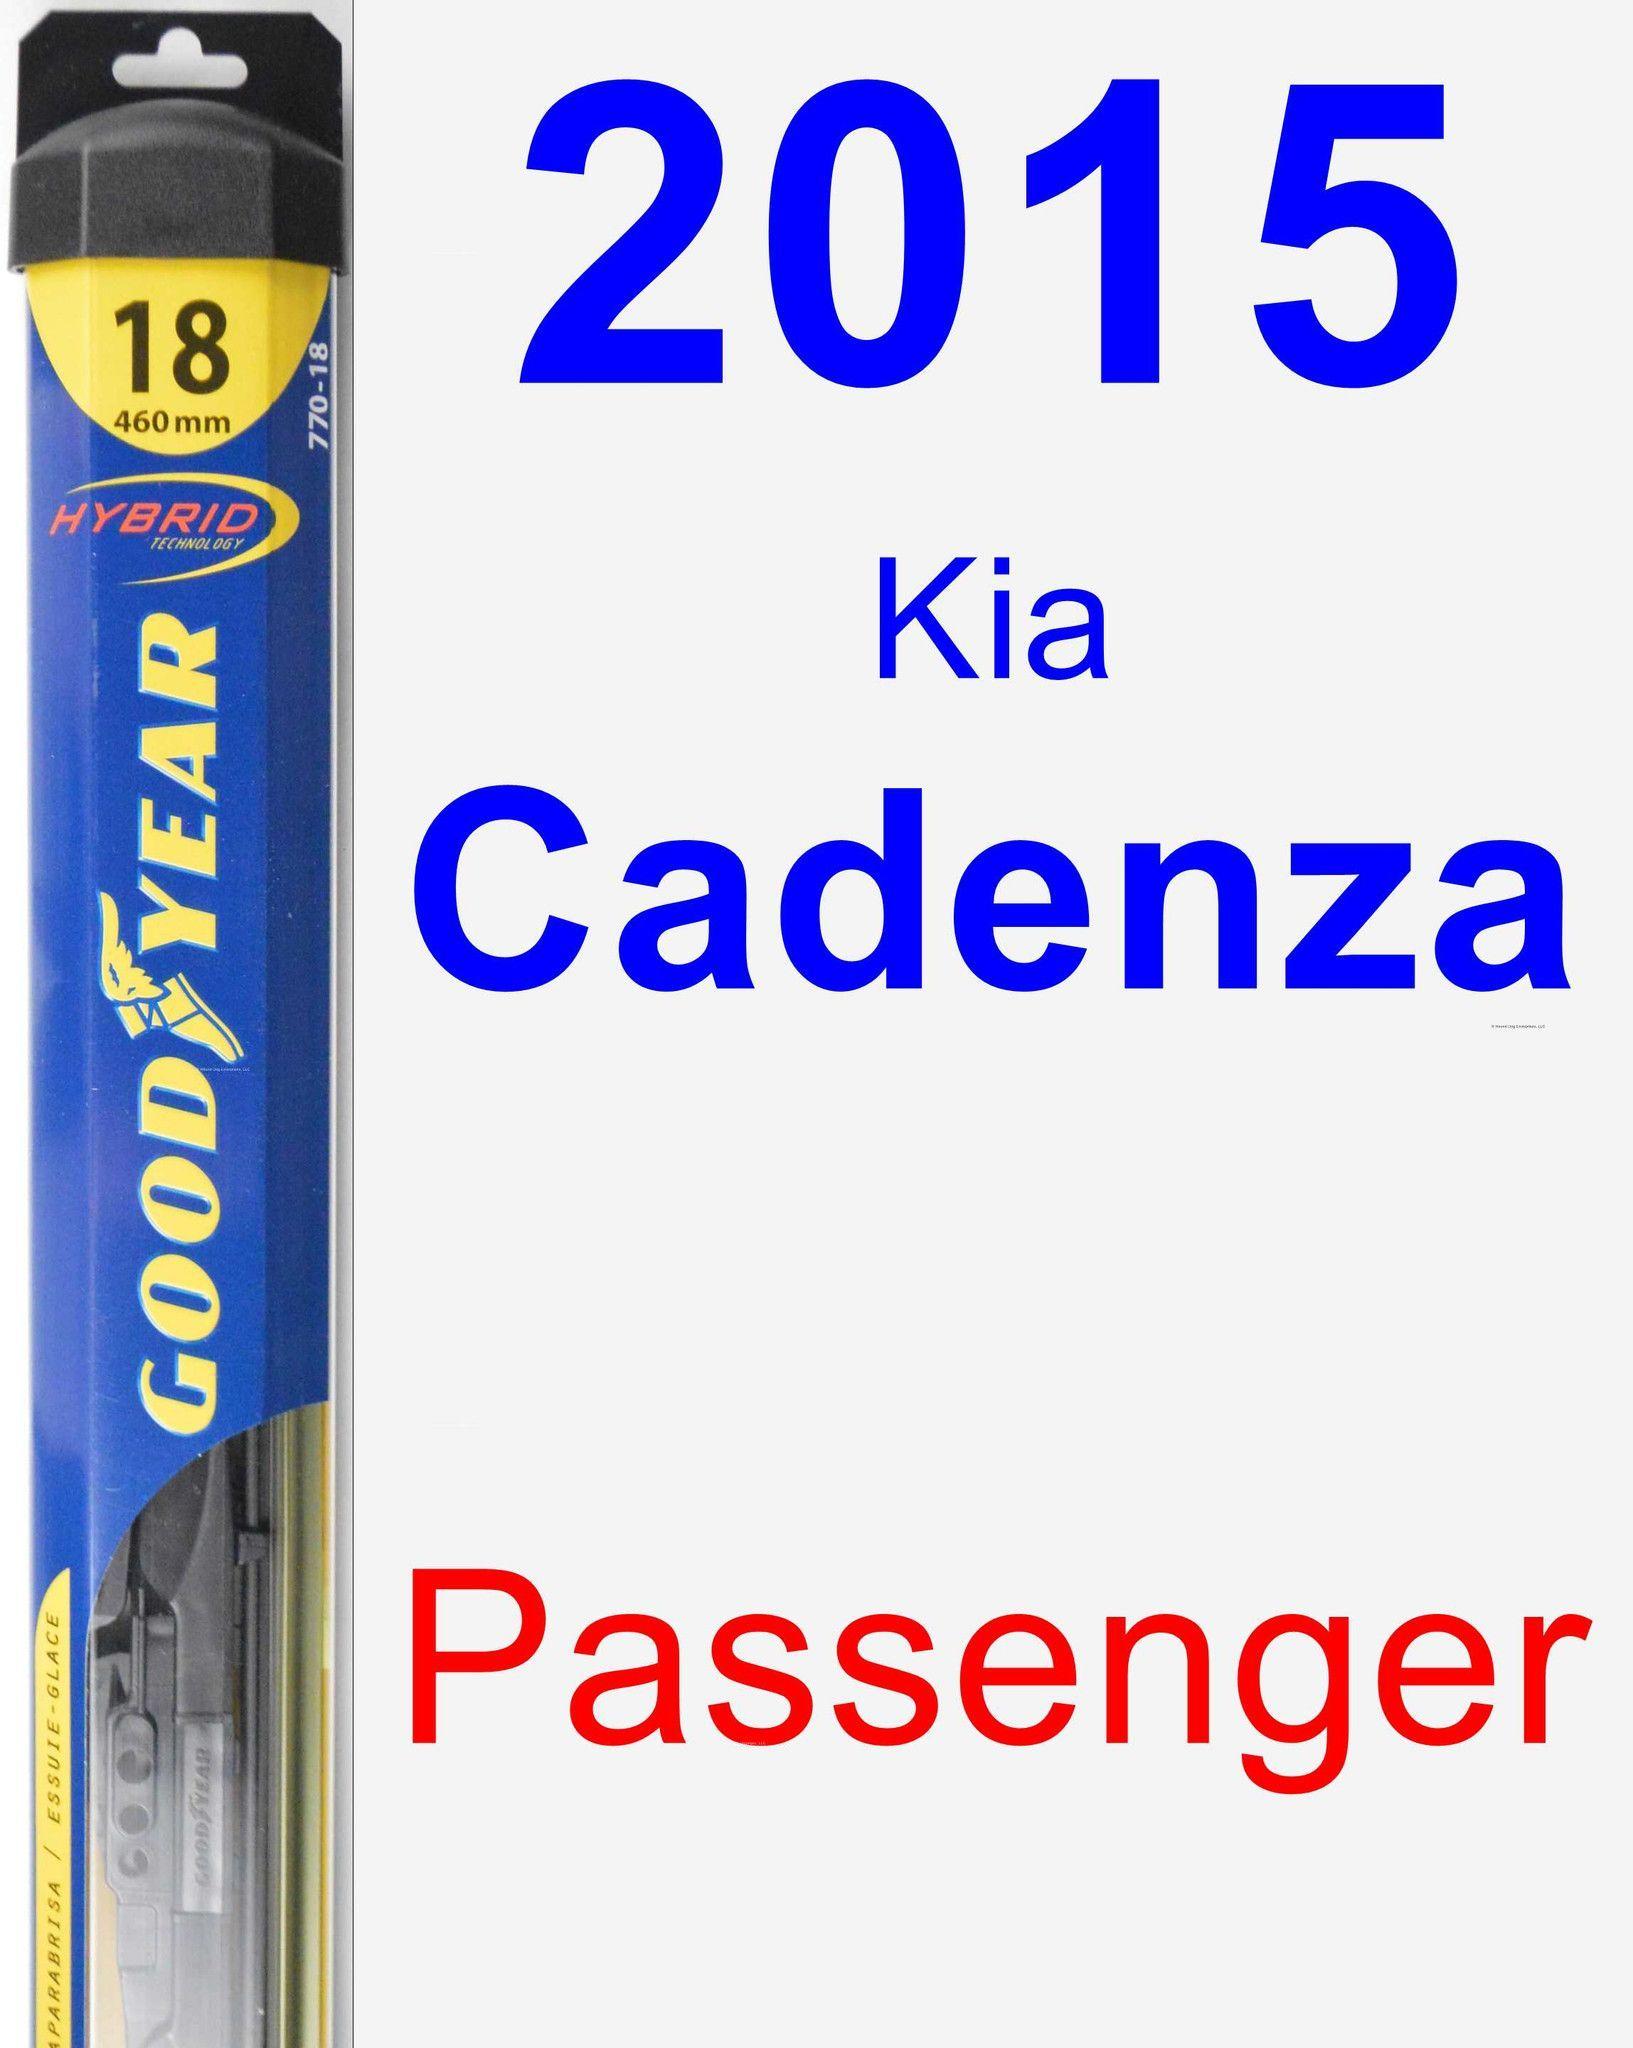 Passenger Wiper Blade for 2015 Kia Cadenza - Hybrid